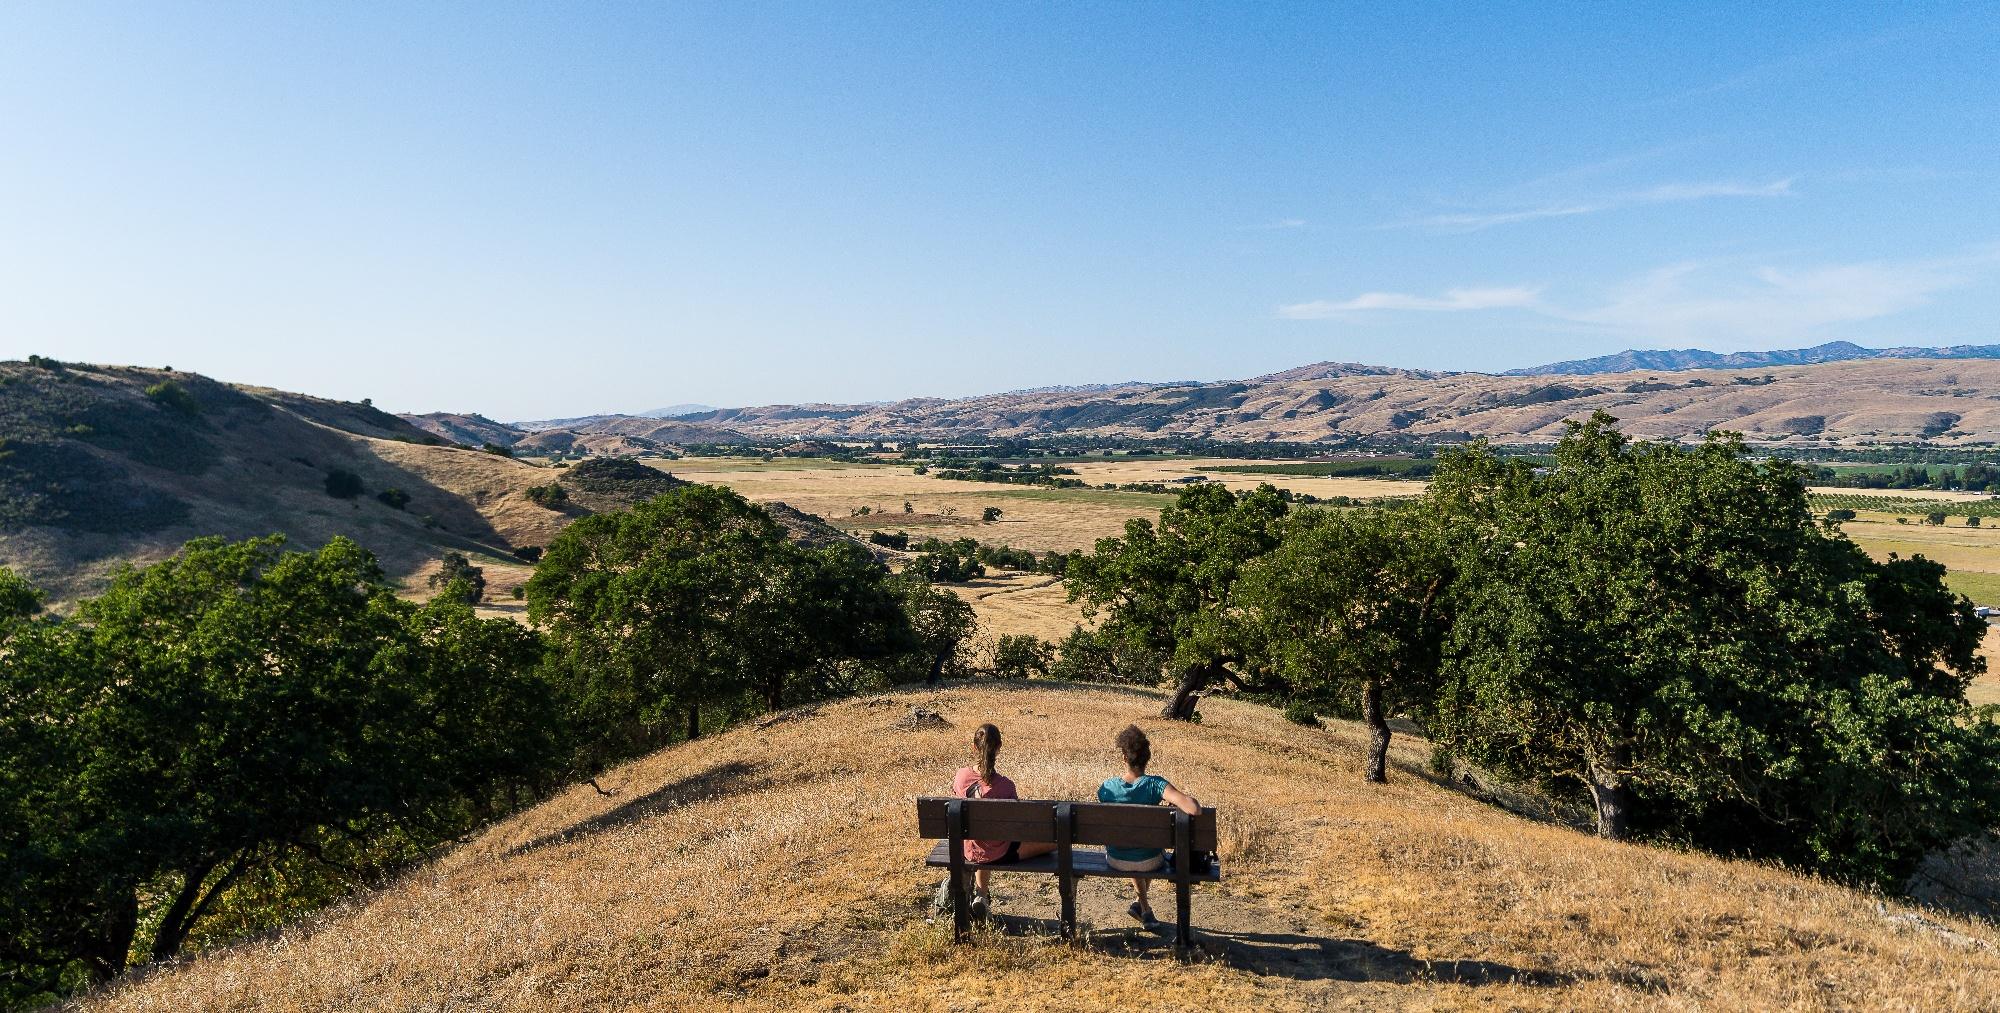 Two hikers on bench overlooking Coyote Valley below